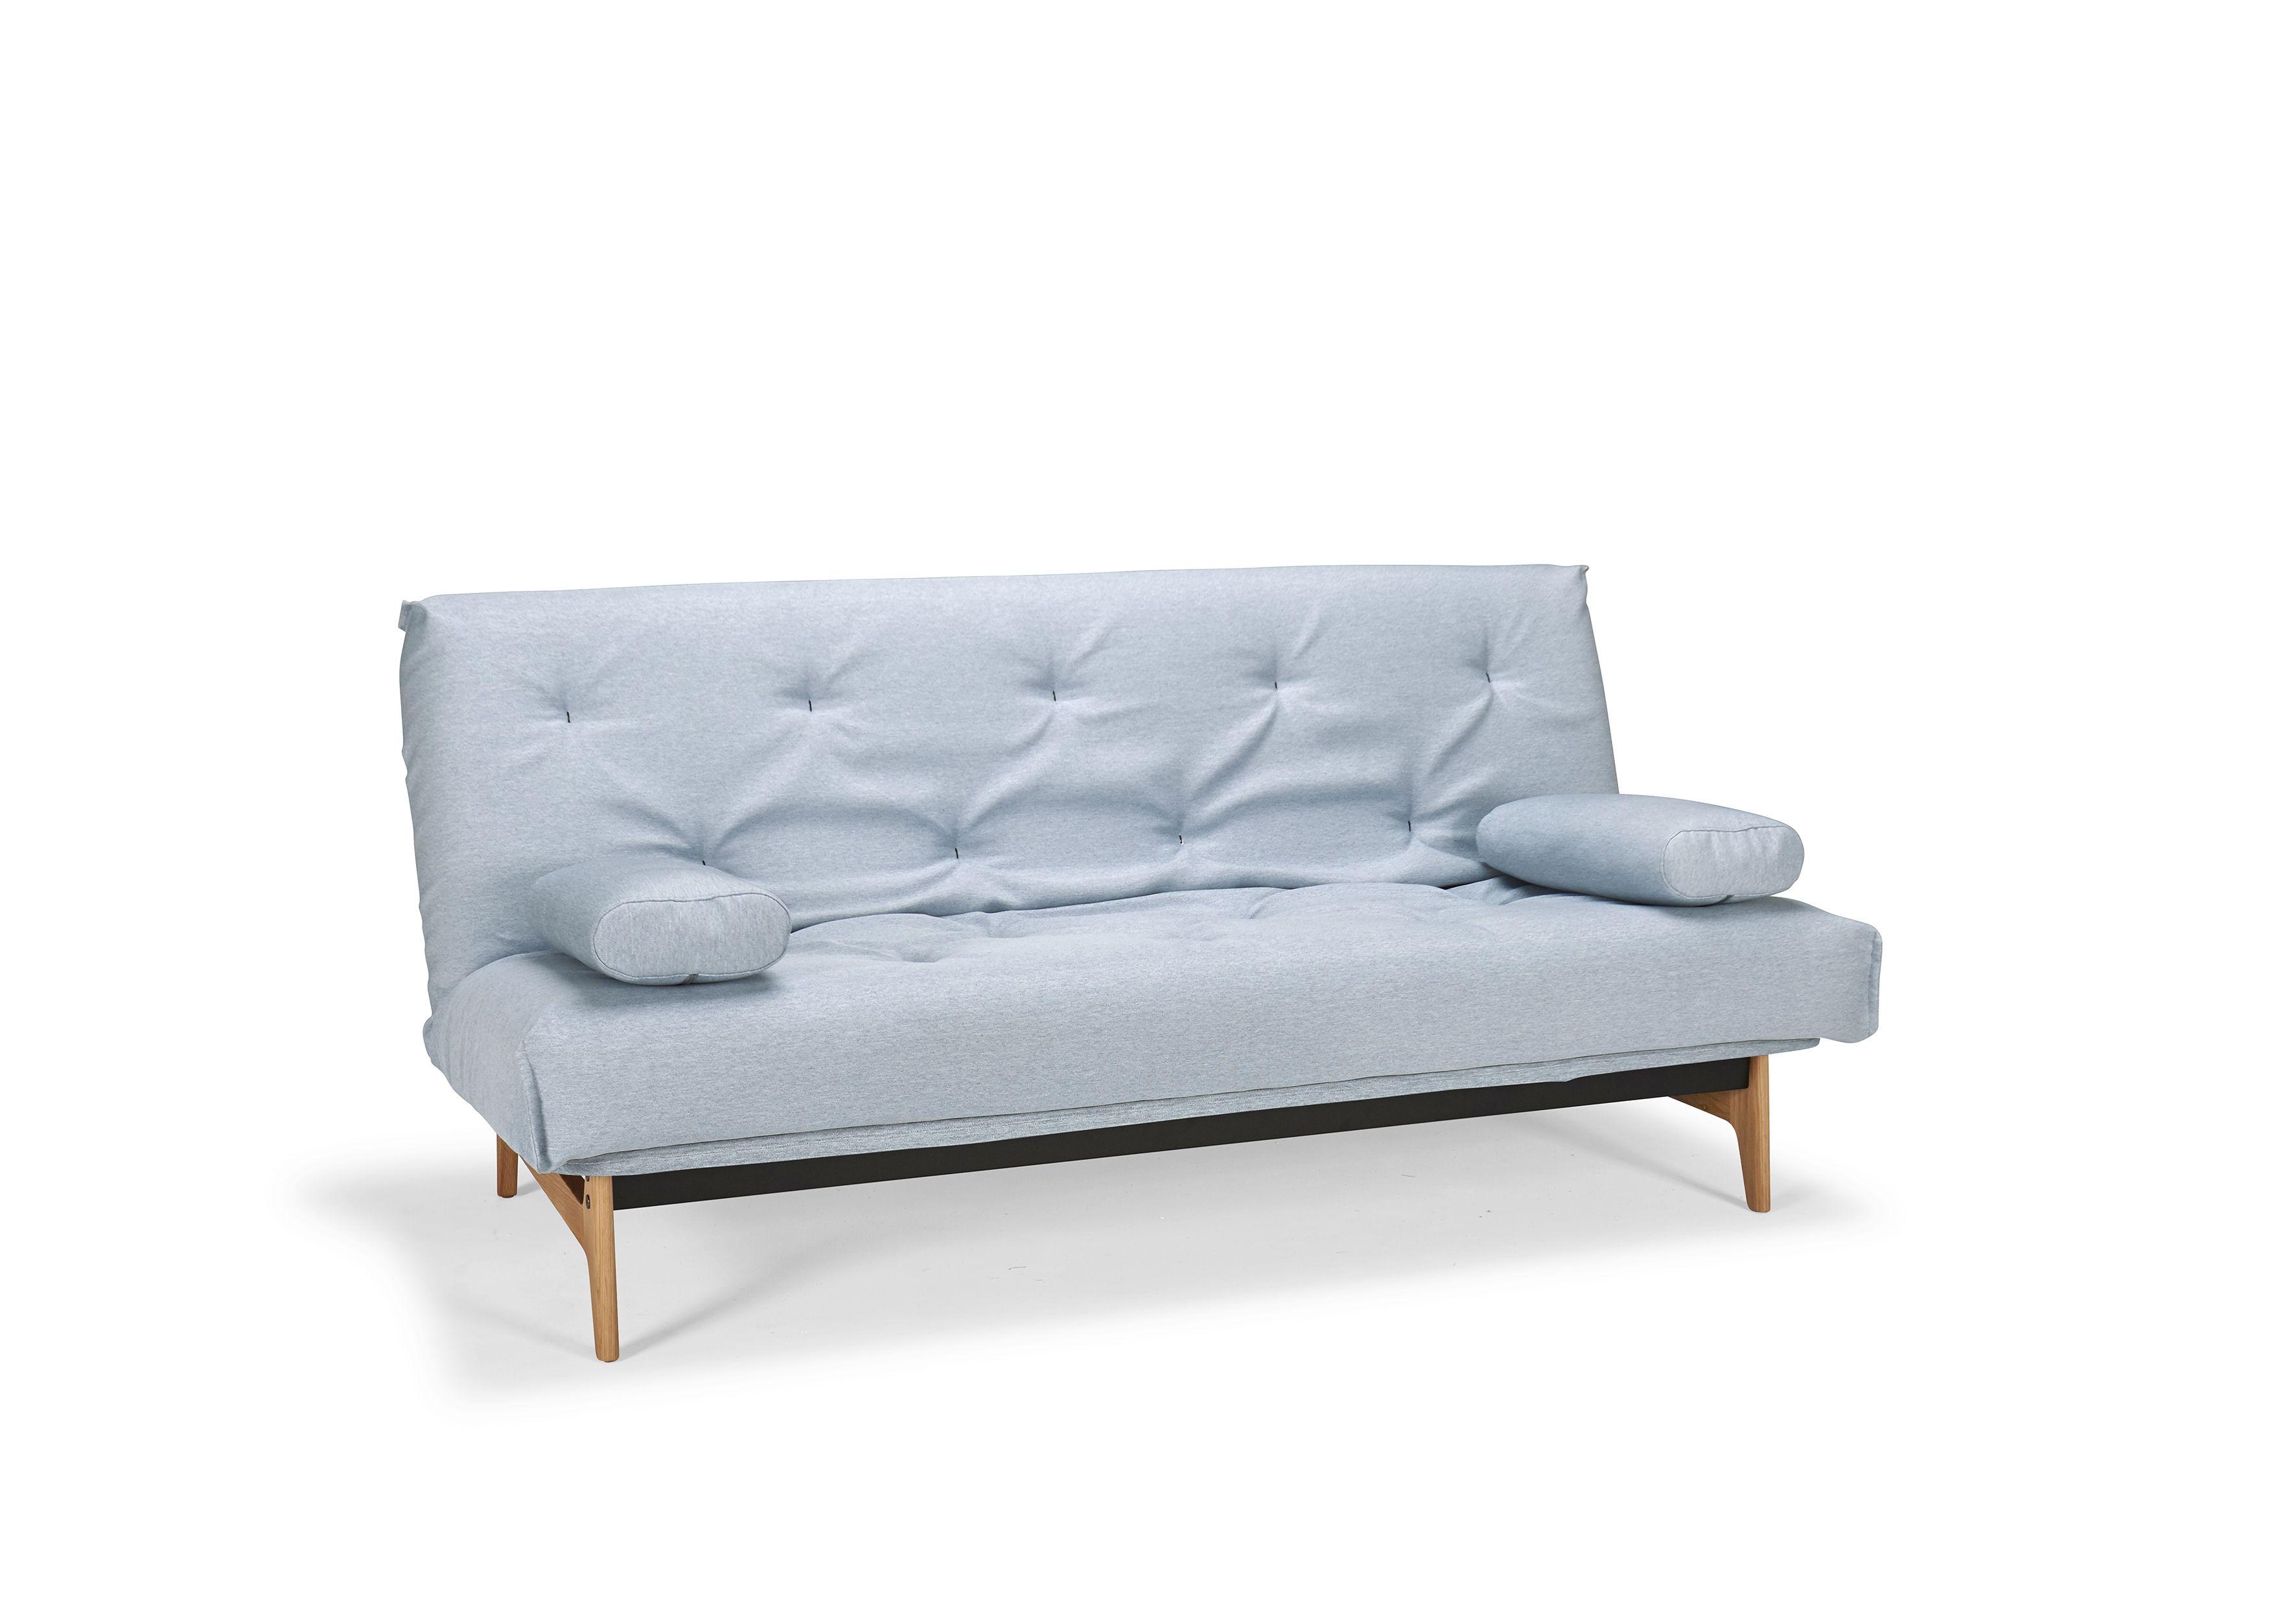 Groovy Dansk Kvalitetssoffa Fran Innovation Living Anpassad For Att Onthecornerstone Fun Painted Chair Ideas Images Onthecornerstoneorg